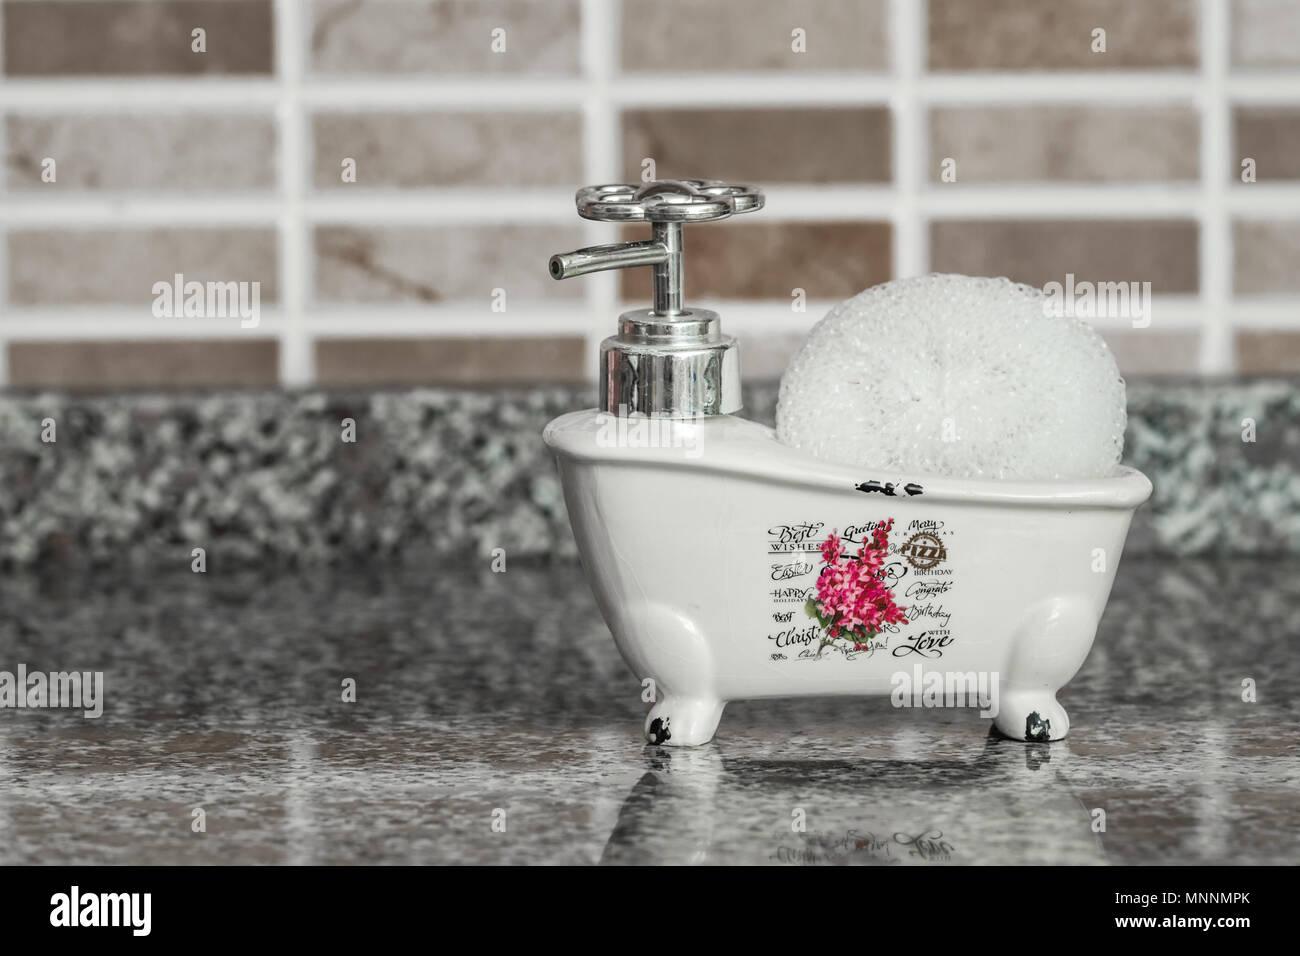 https www alamy com decorative ceramic mini claw foot bathtub soap dish with bath sponge image185488763 html